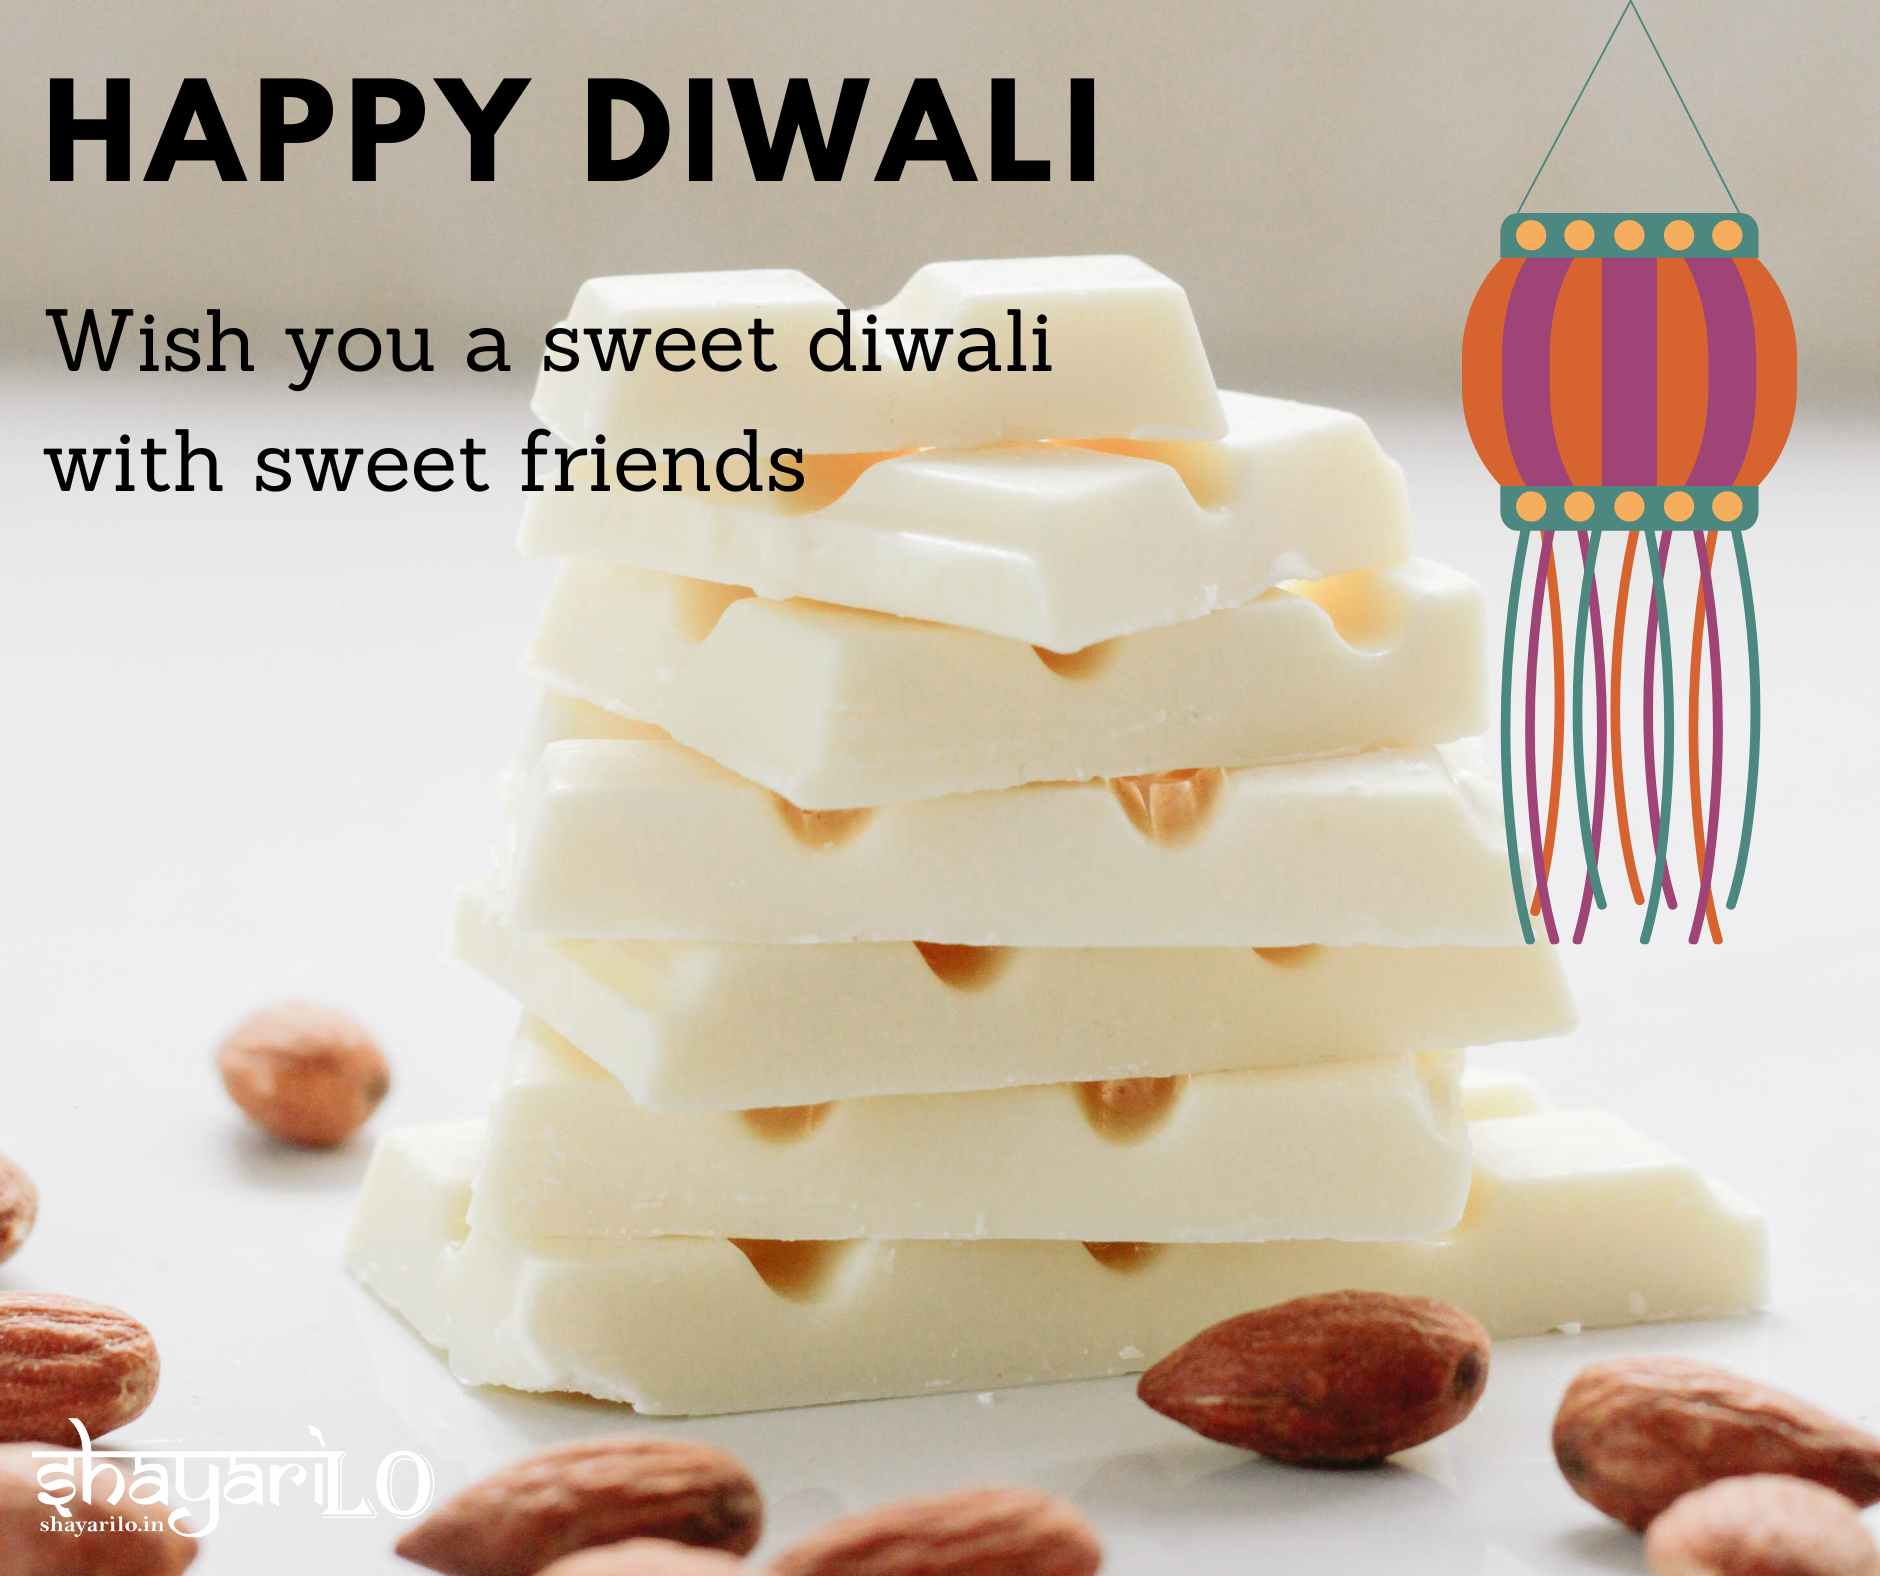 Sweet diwali wishes